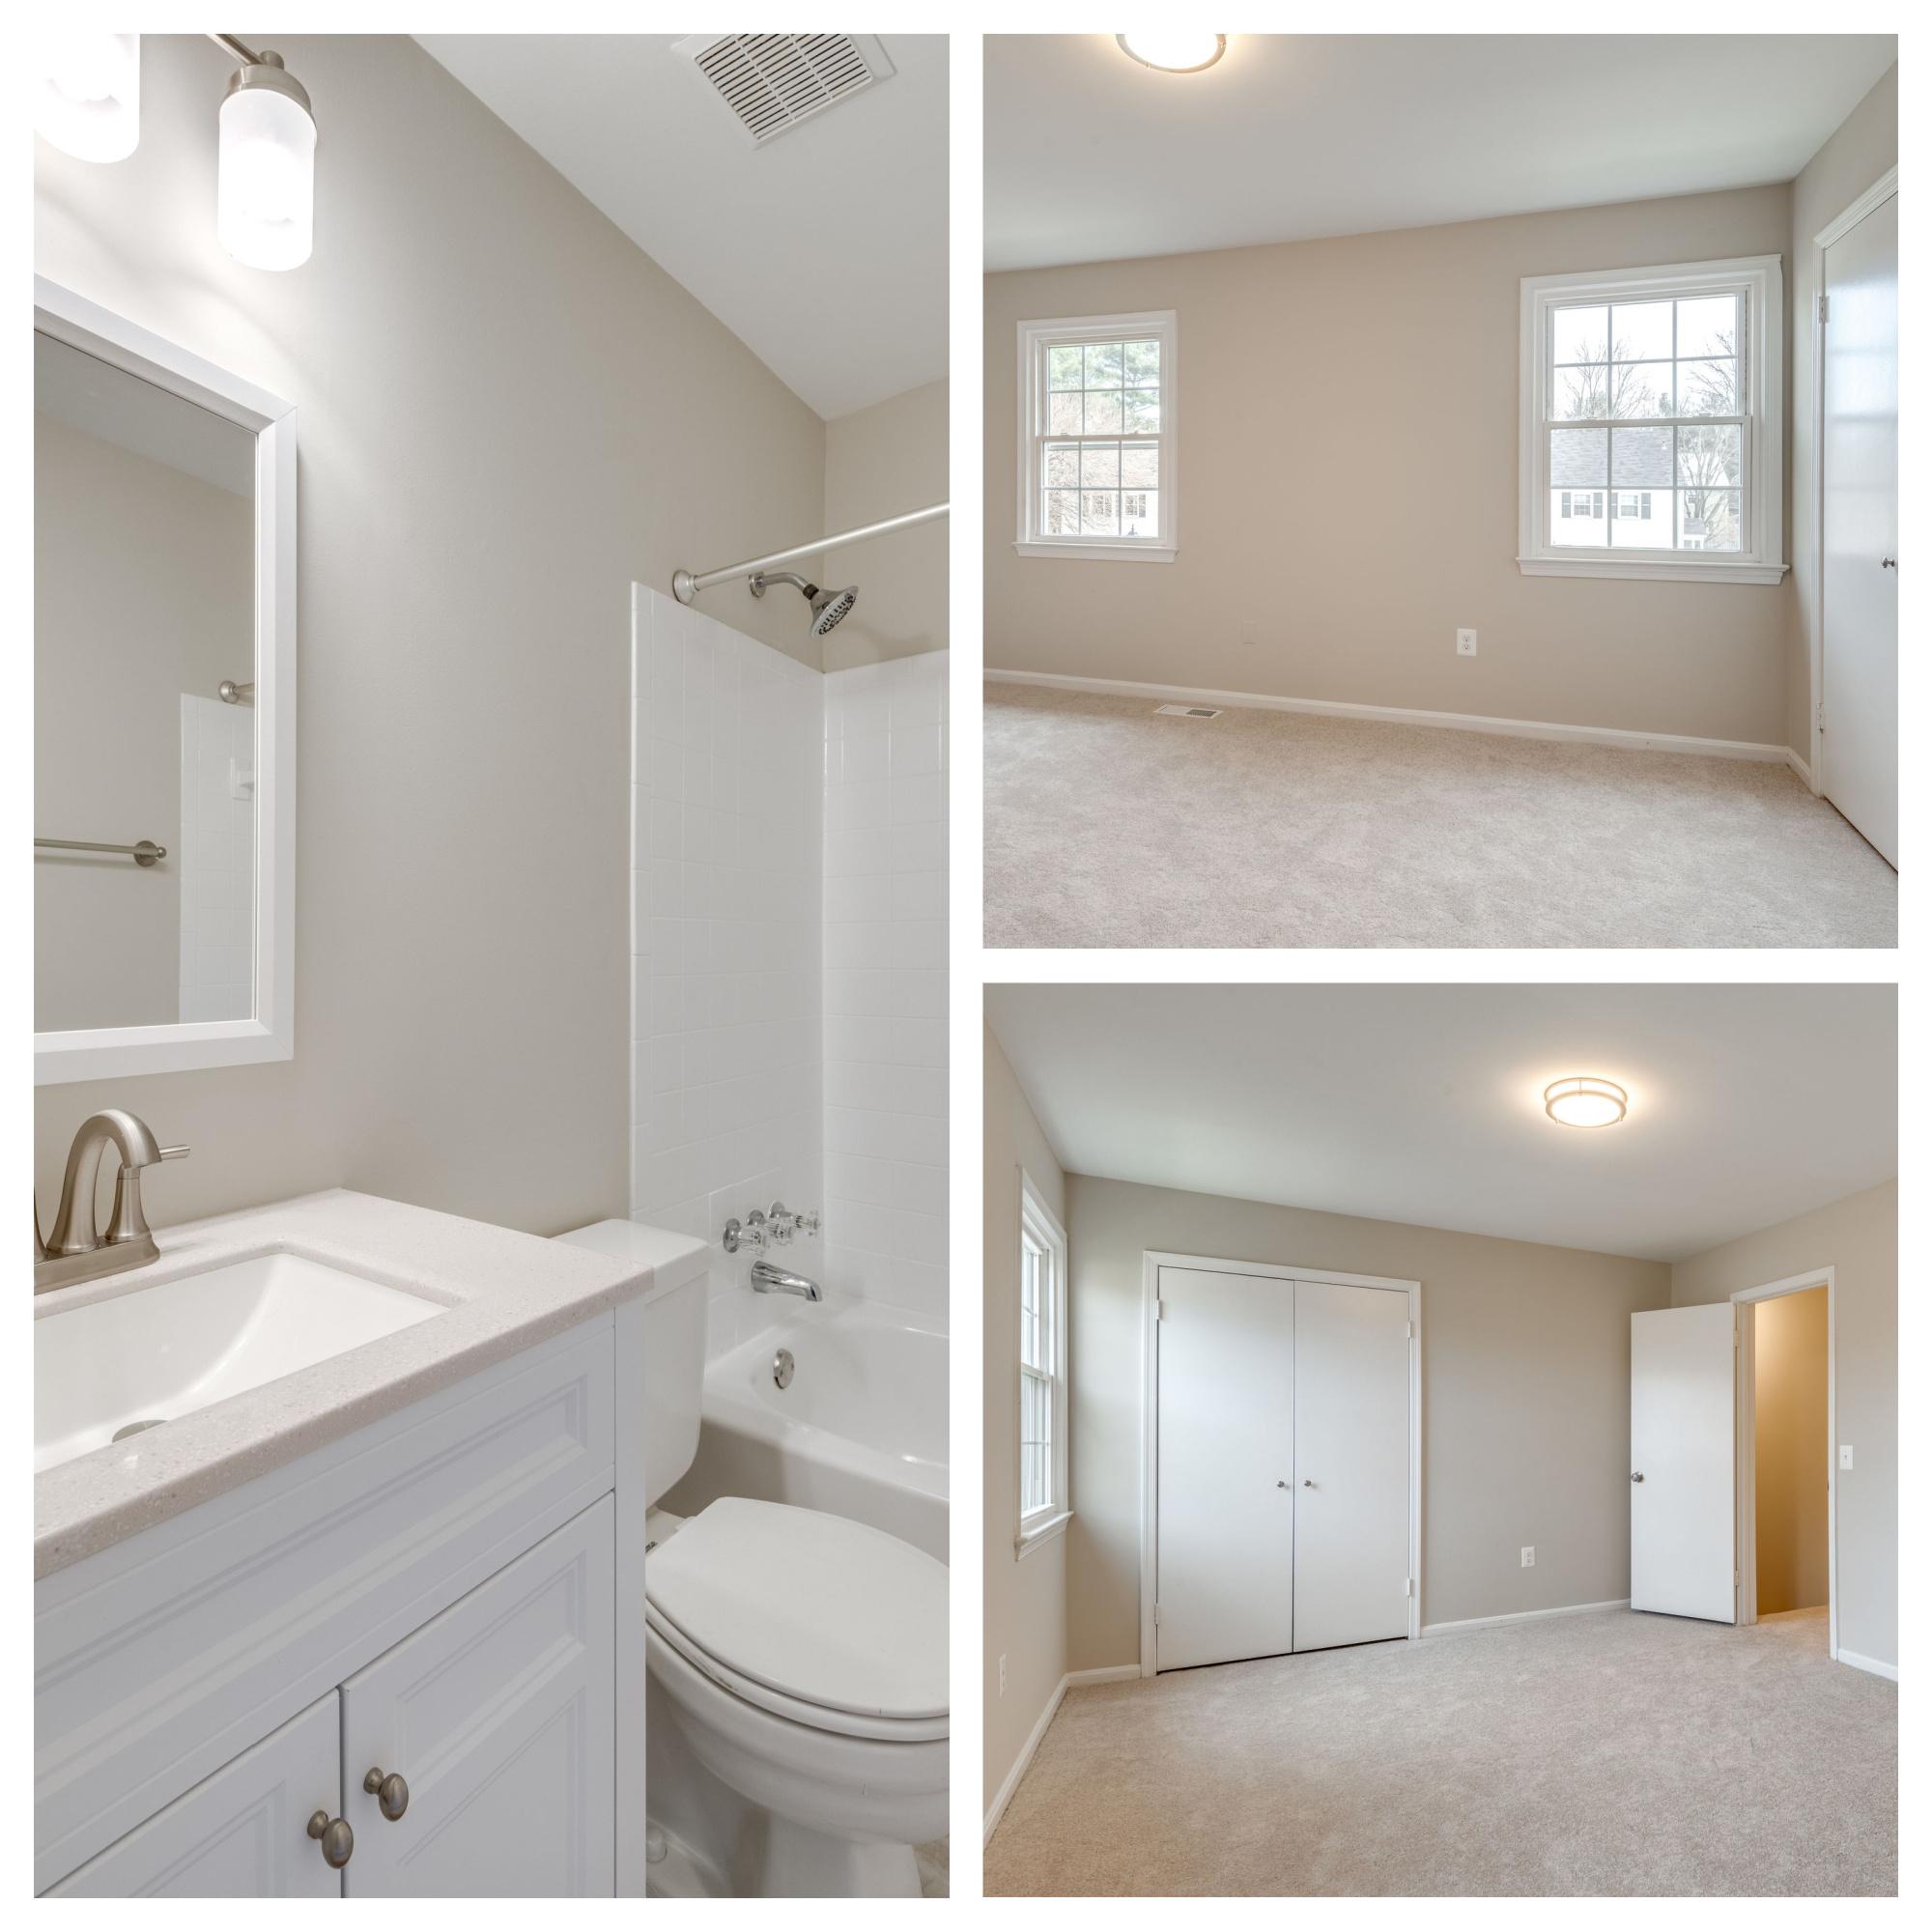 403 Maple Ct, Herndon- Primary Suite